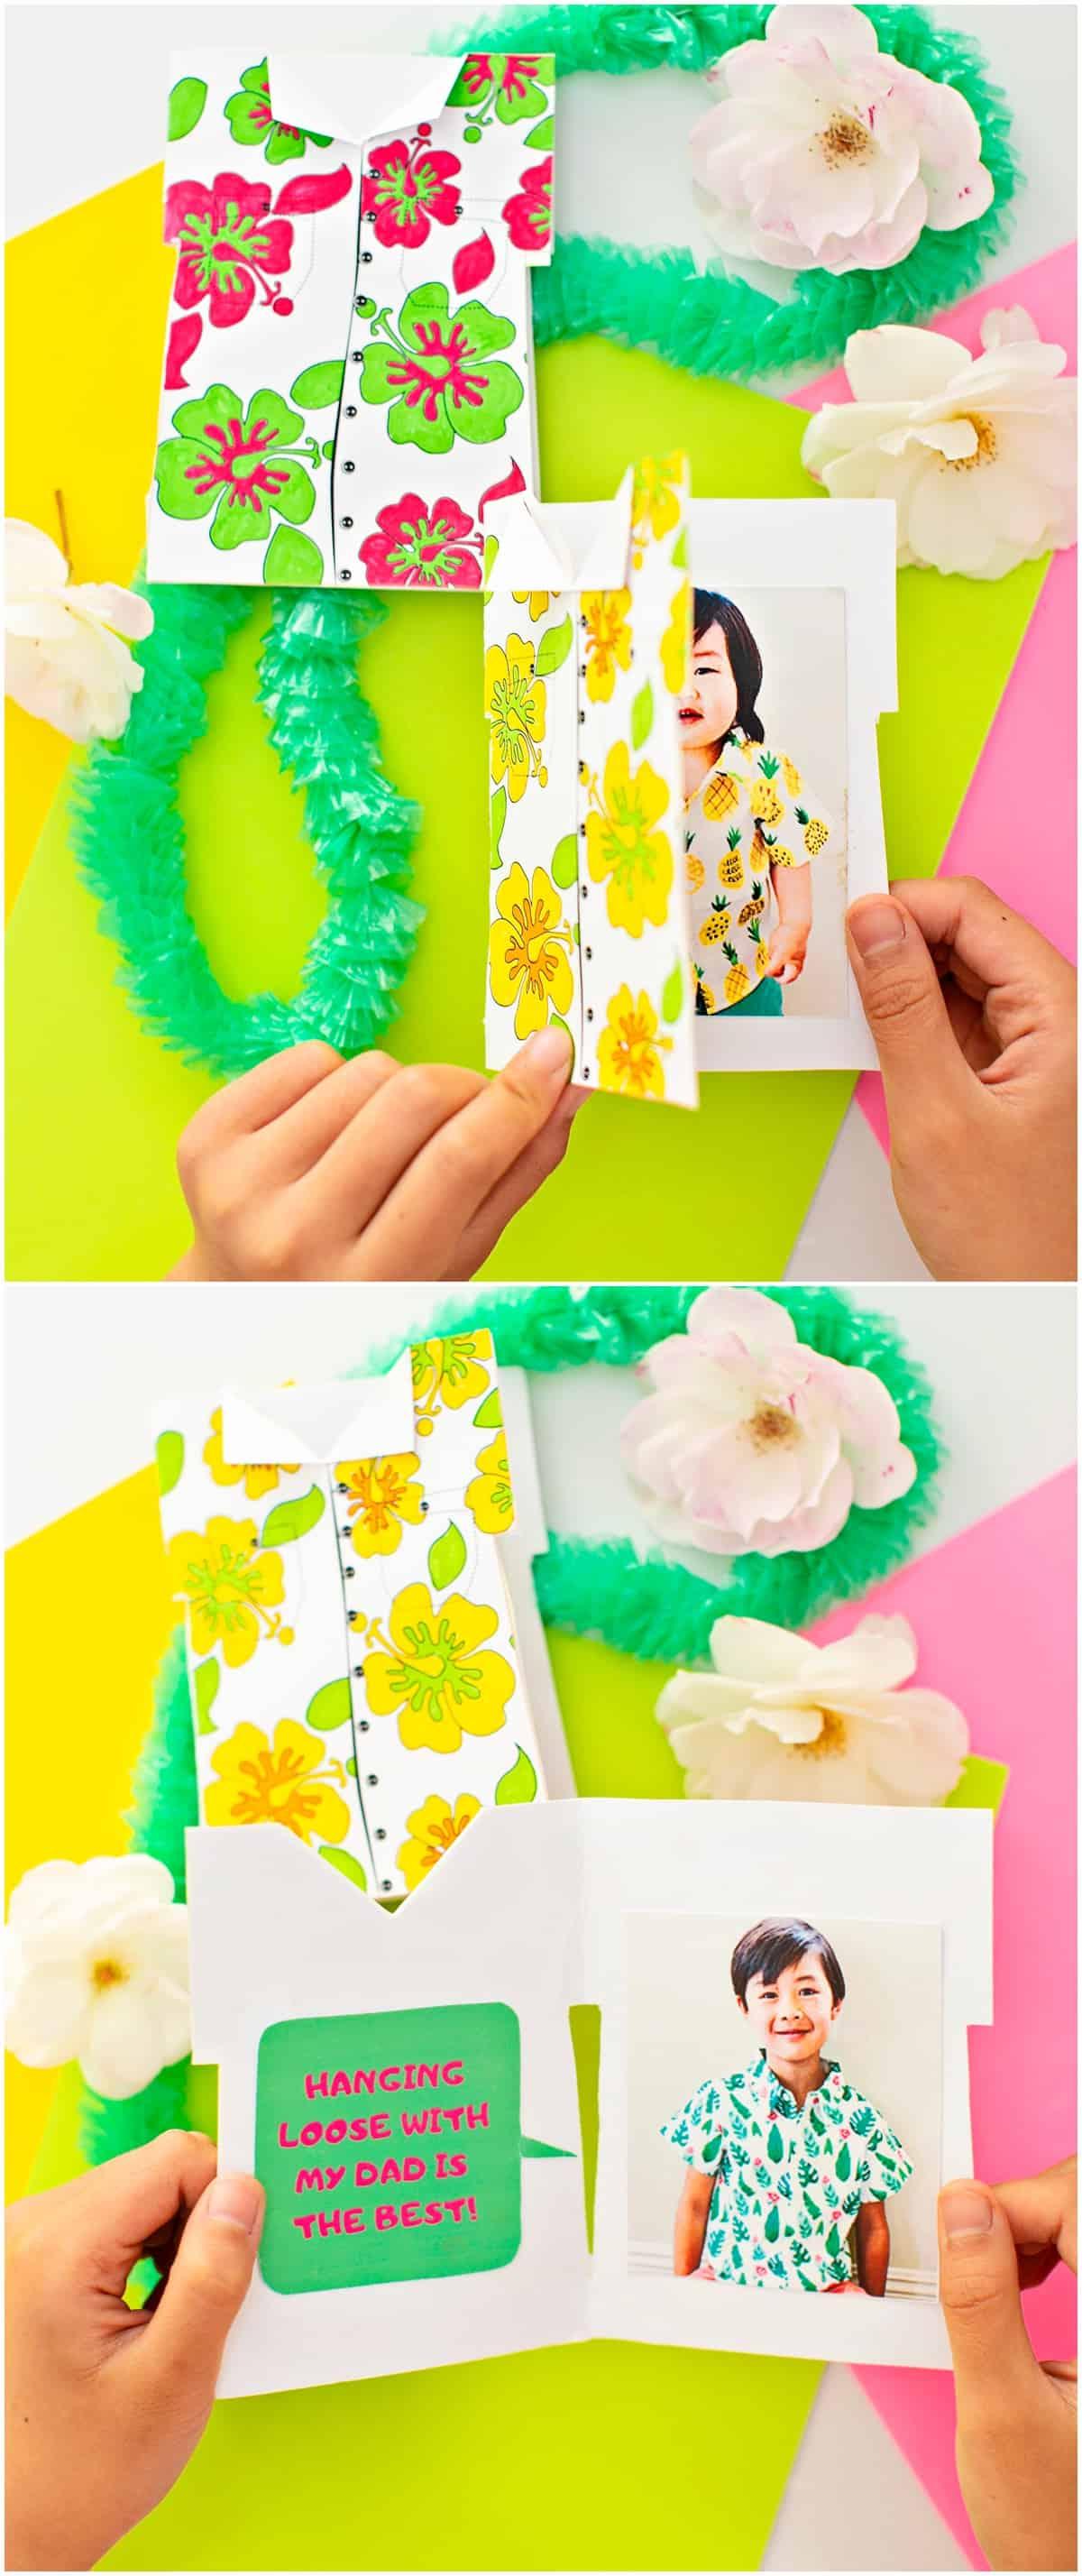 Handmade Hawaiian Shirt Father's Day Card Printable With Photo Kids Can Make.